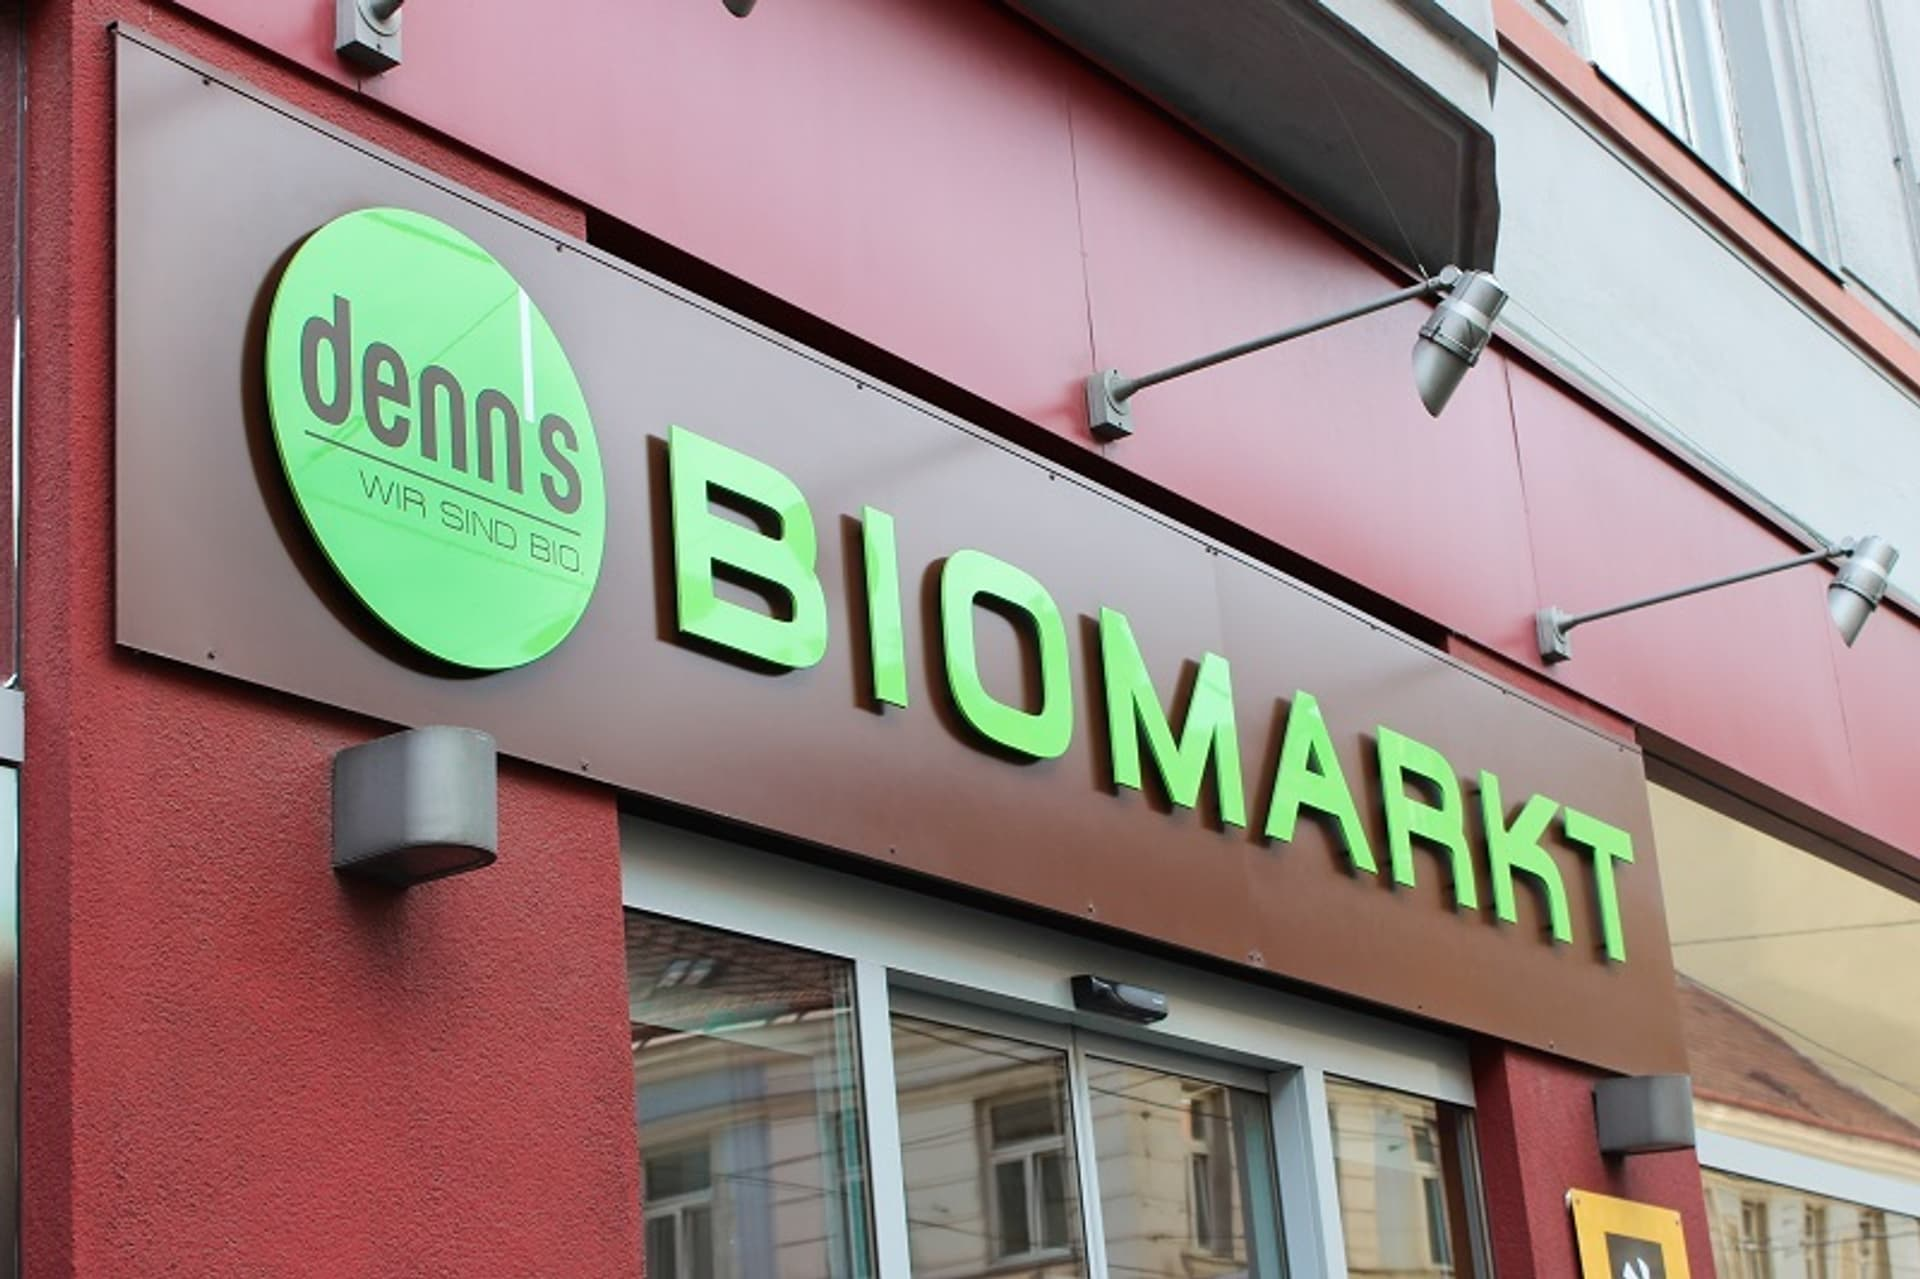 Denns Biomarkt Schriftzug c denns